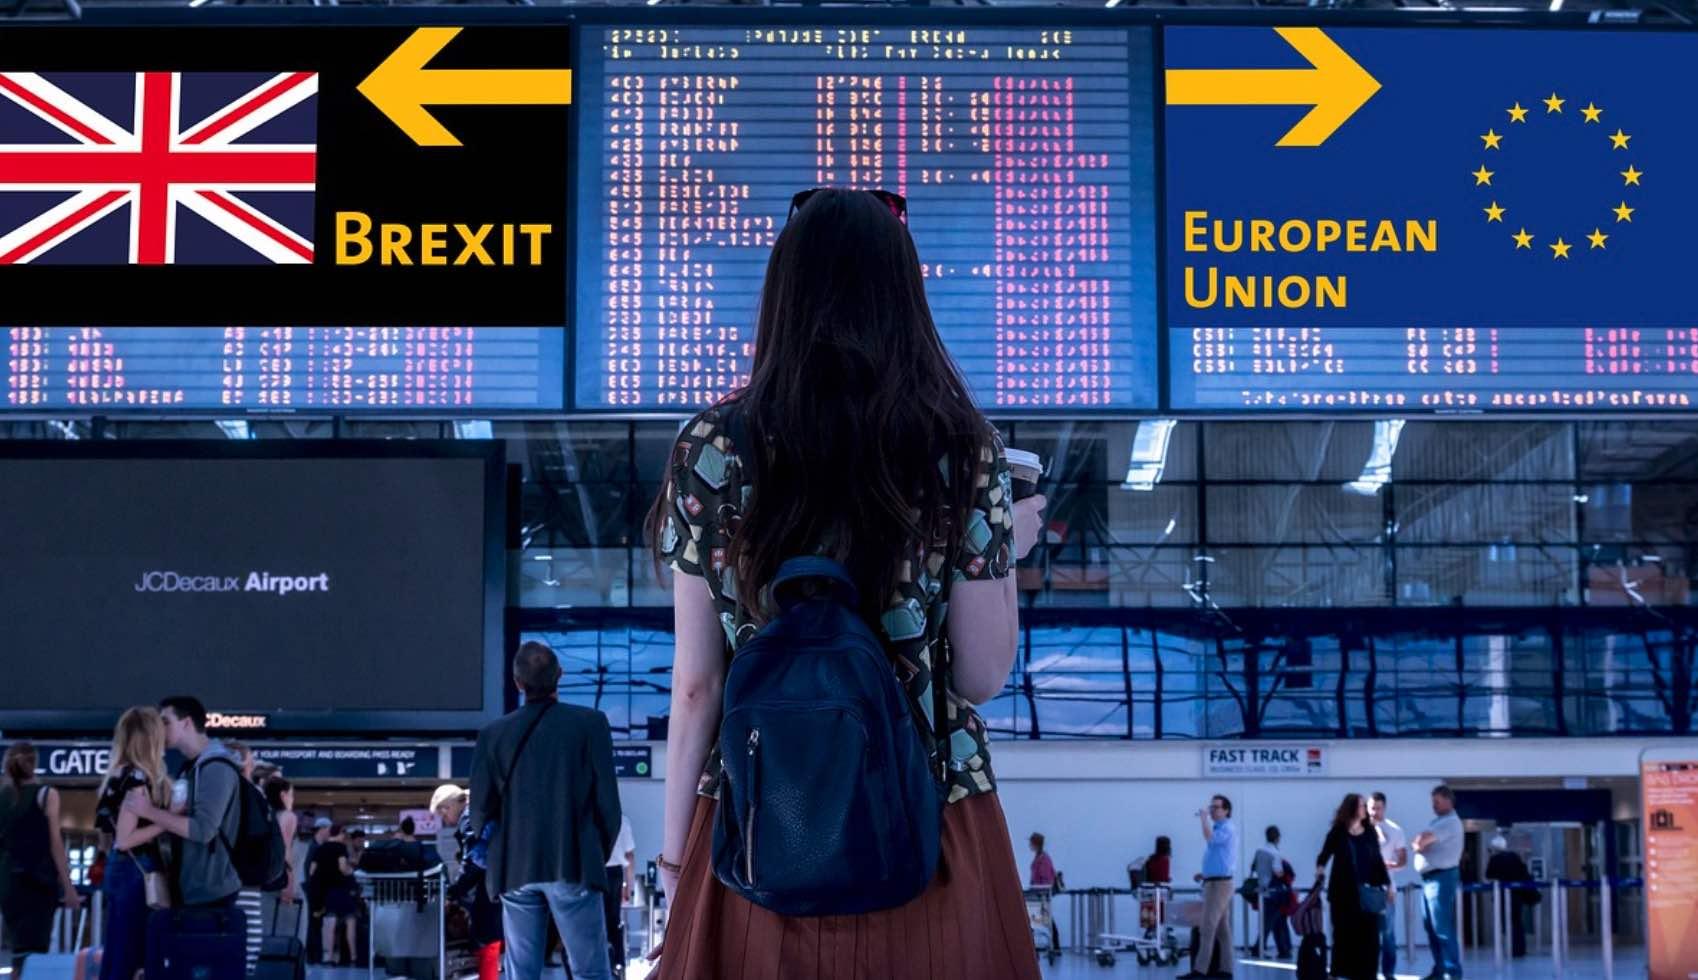 Reino Unido, Brexit, Gran Bretaña, Irlanda, Referendum en Irlanda